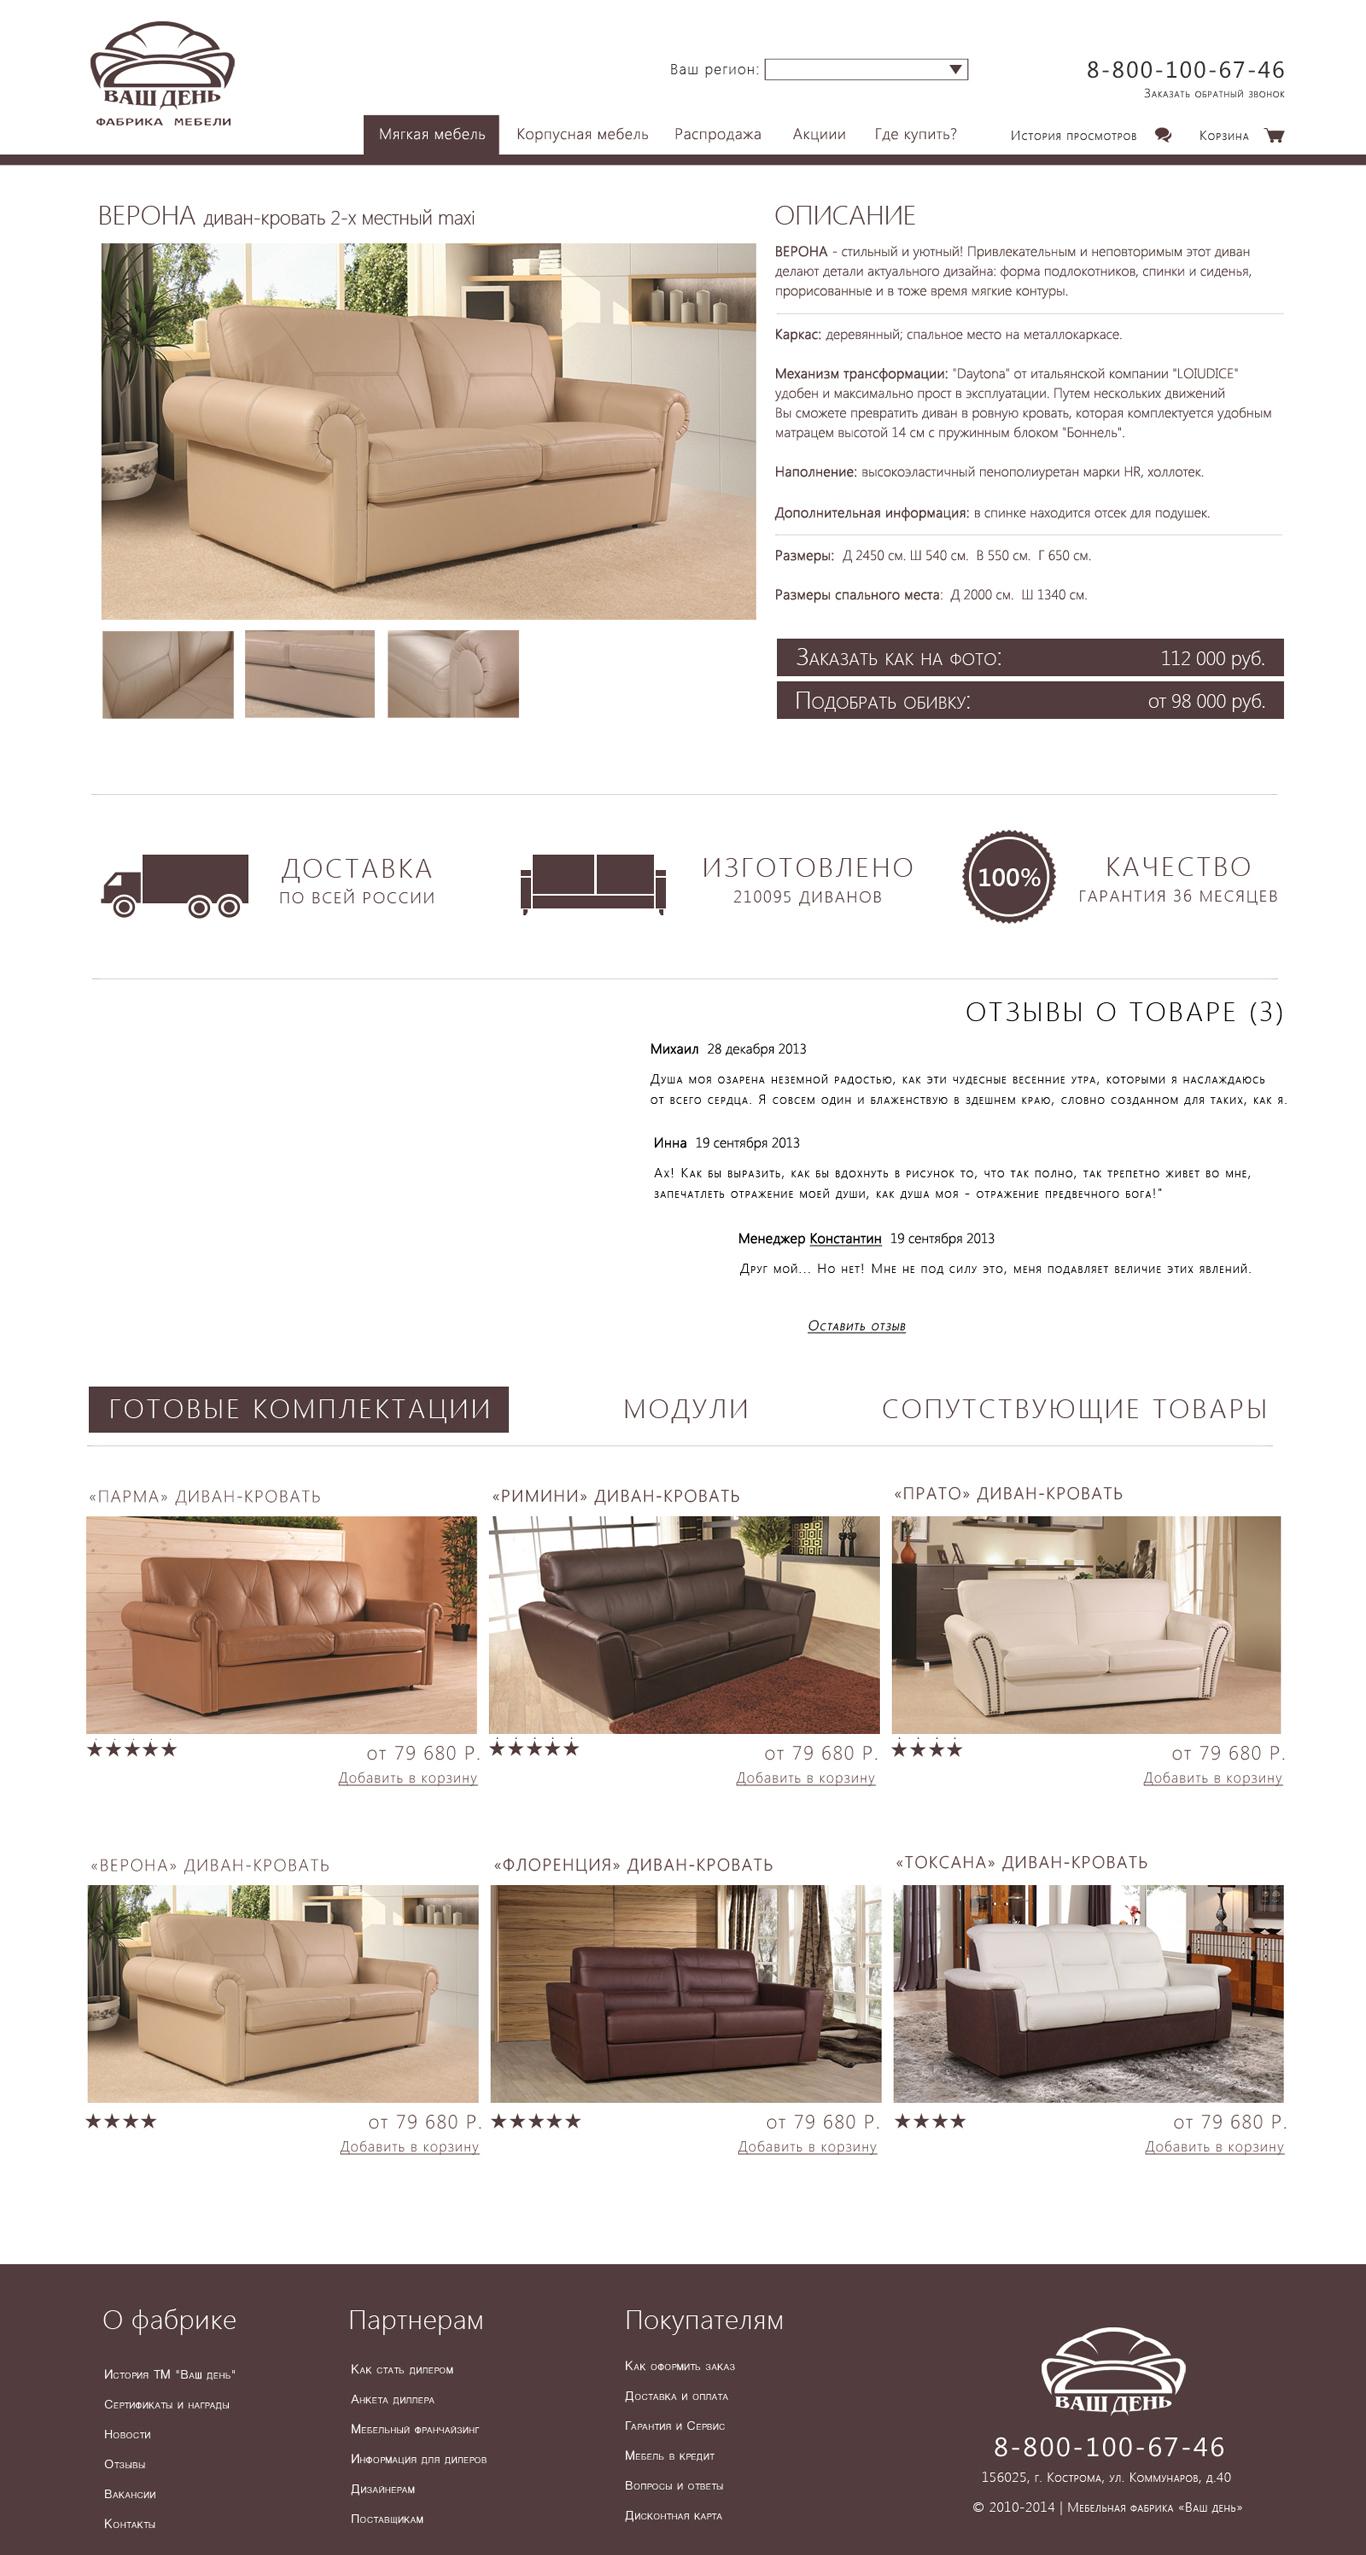 Разработать дизайн для интернет-магазина мебели фото f_27652f2136a80192.jpg